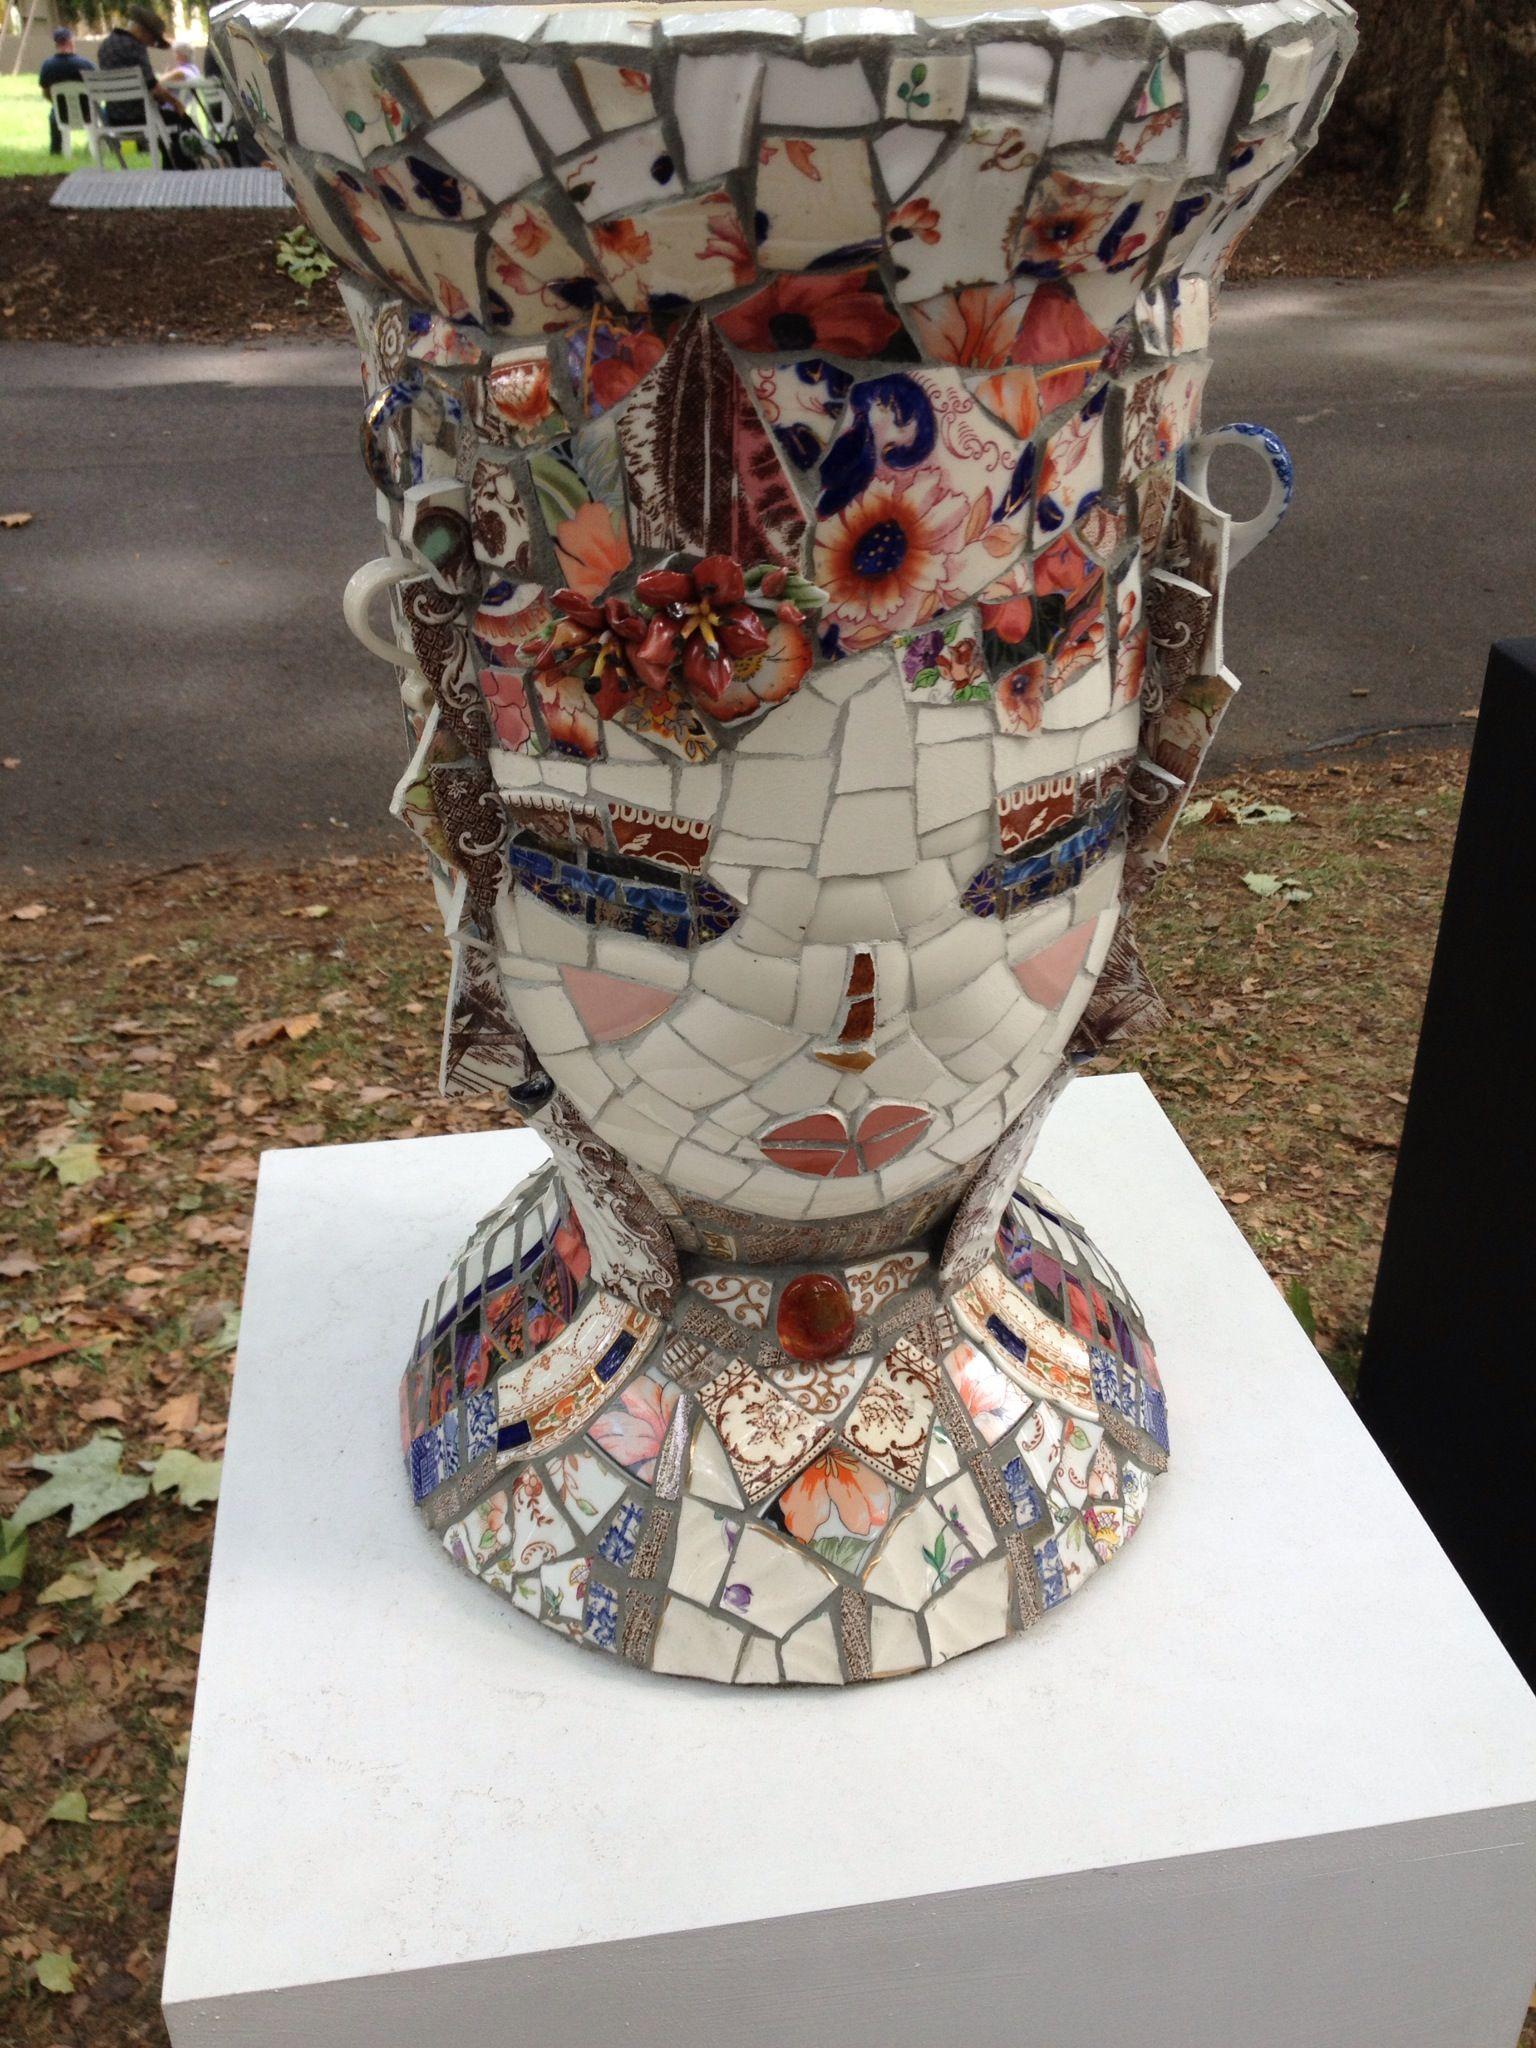 My Friend Mary S Mosaic Head Pot Plants And China